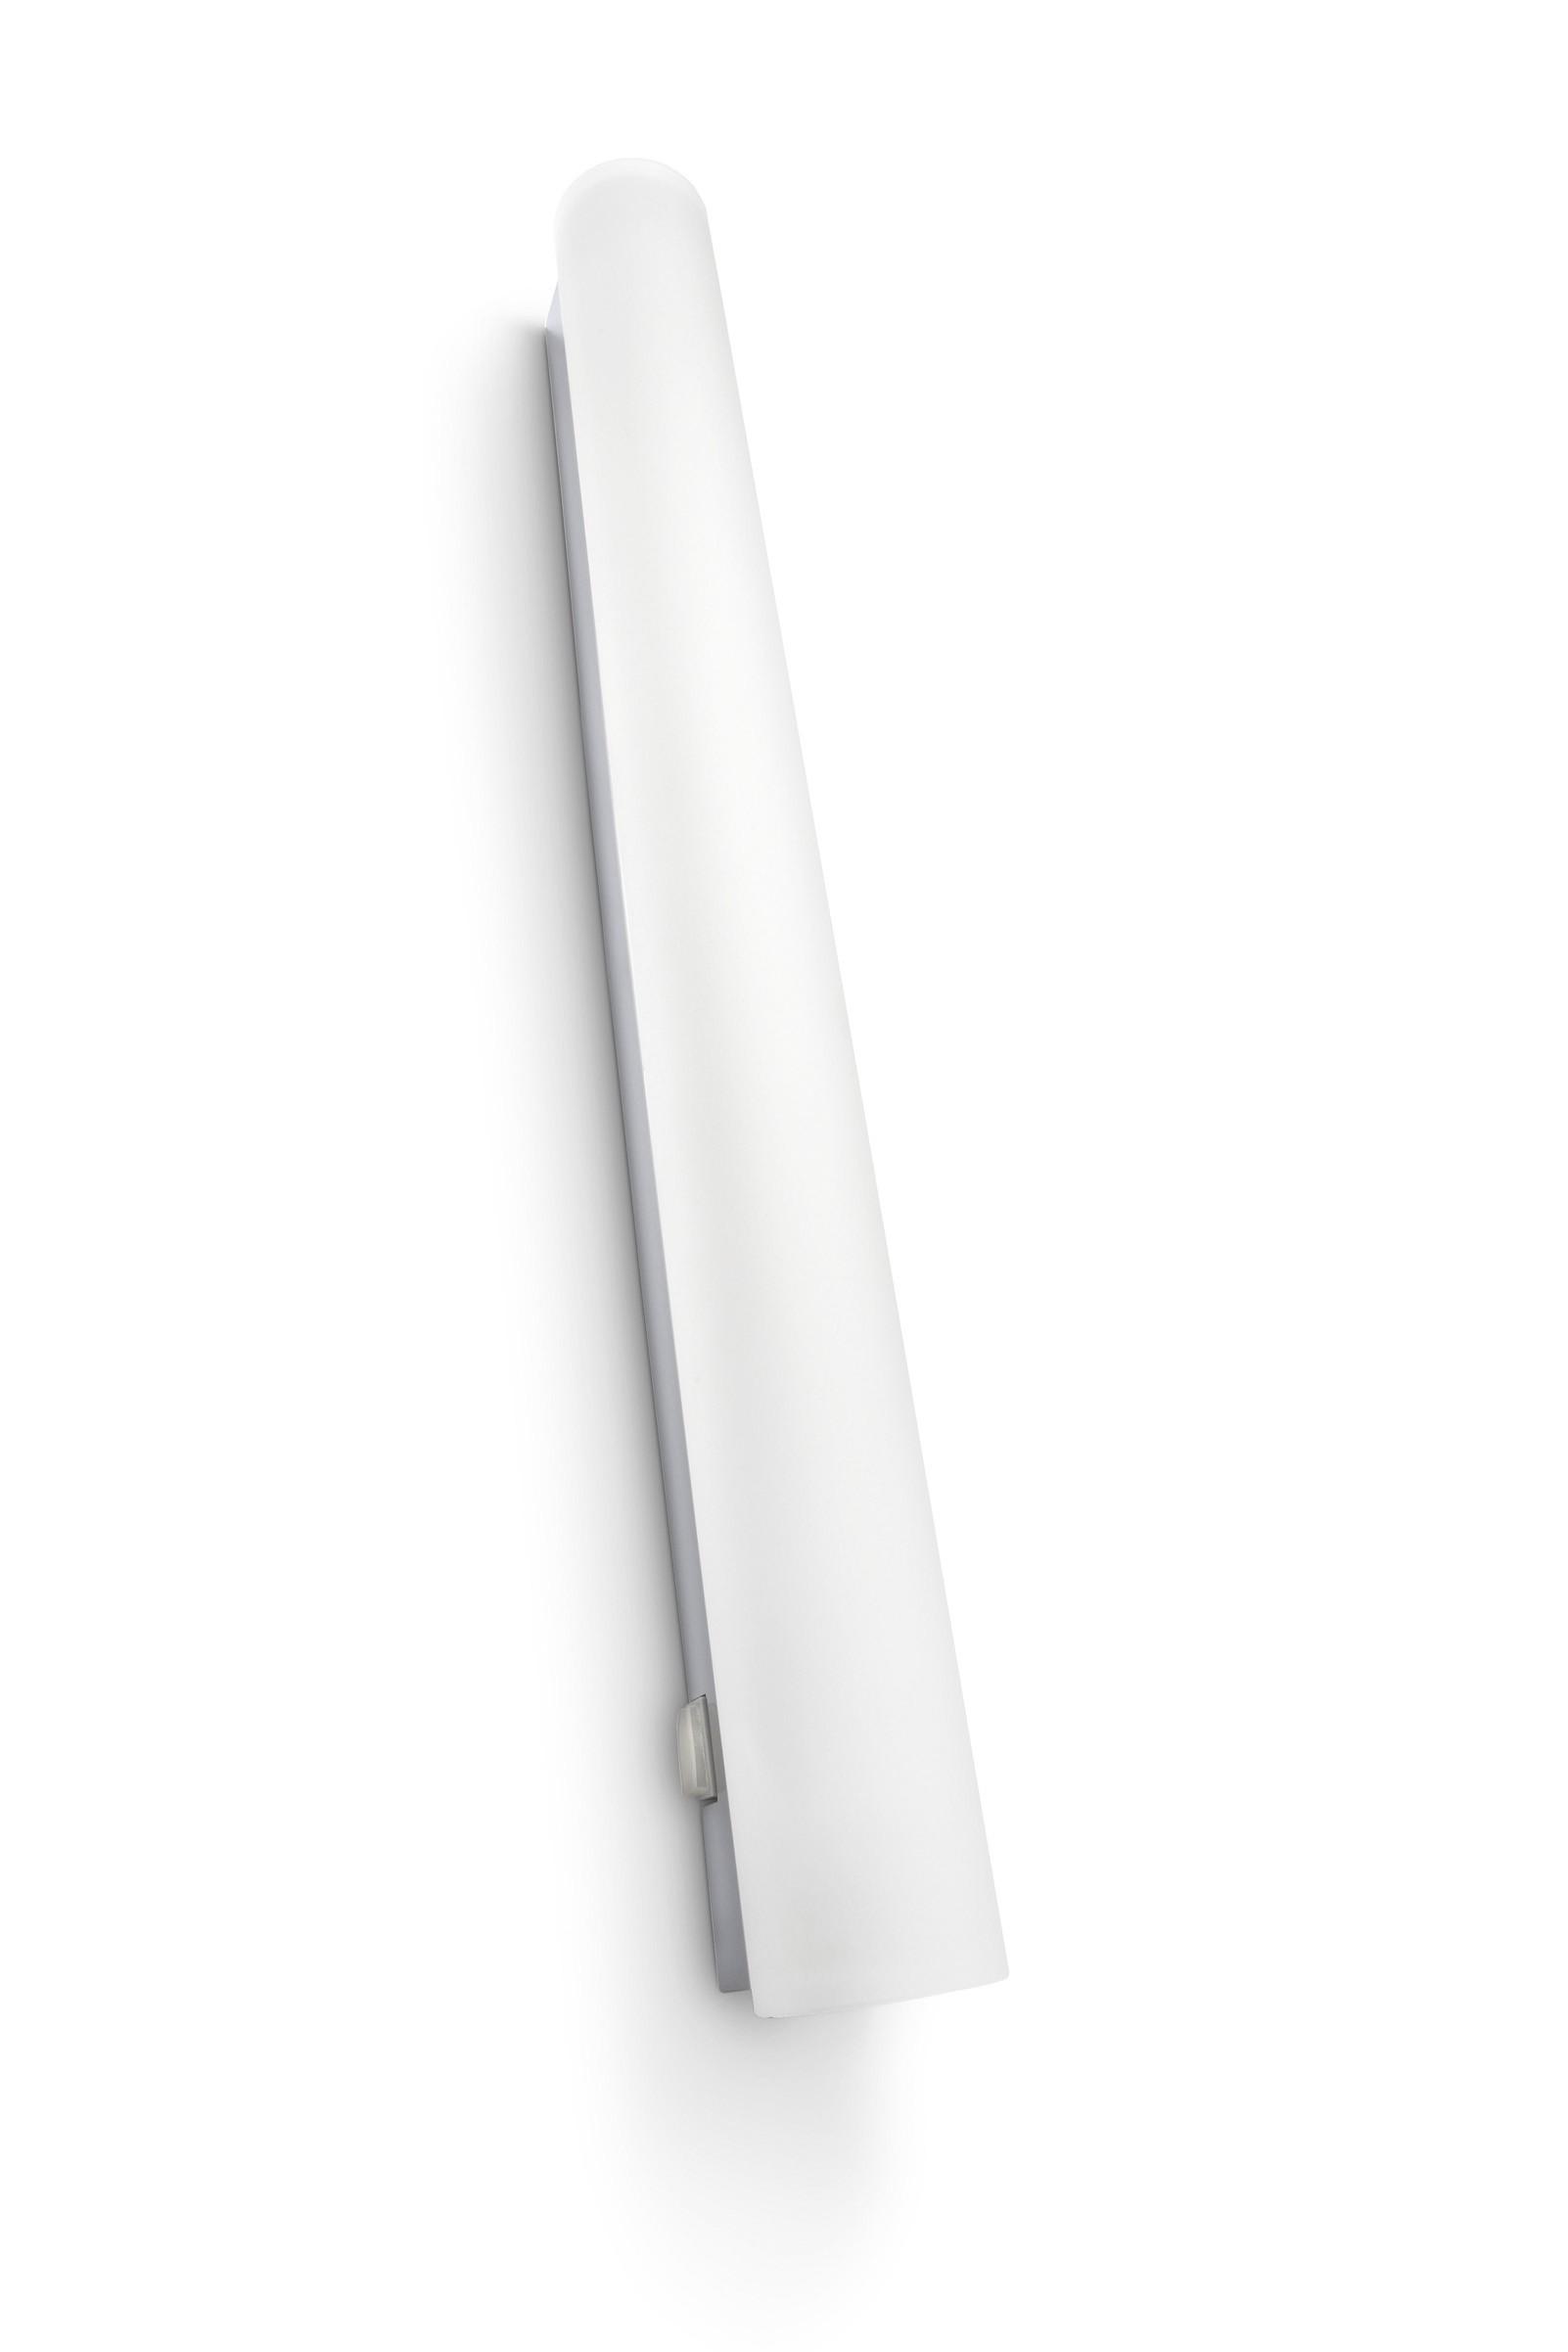 philips mybathroom vitalise 34094 11 16 wandlamp badkamerverlichting. Black Bedroom Furniture Sets. Home Design Ideas